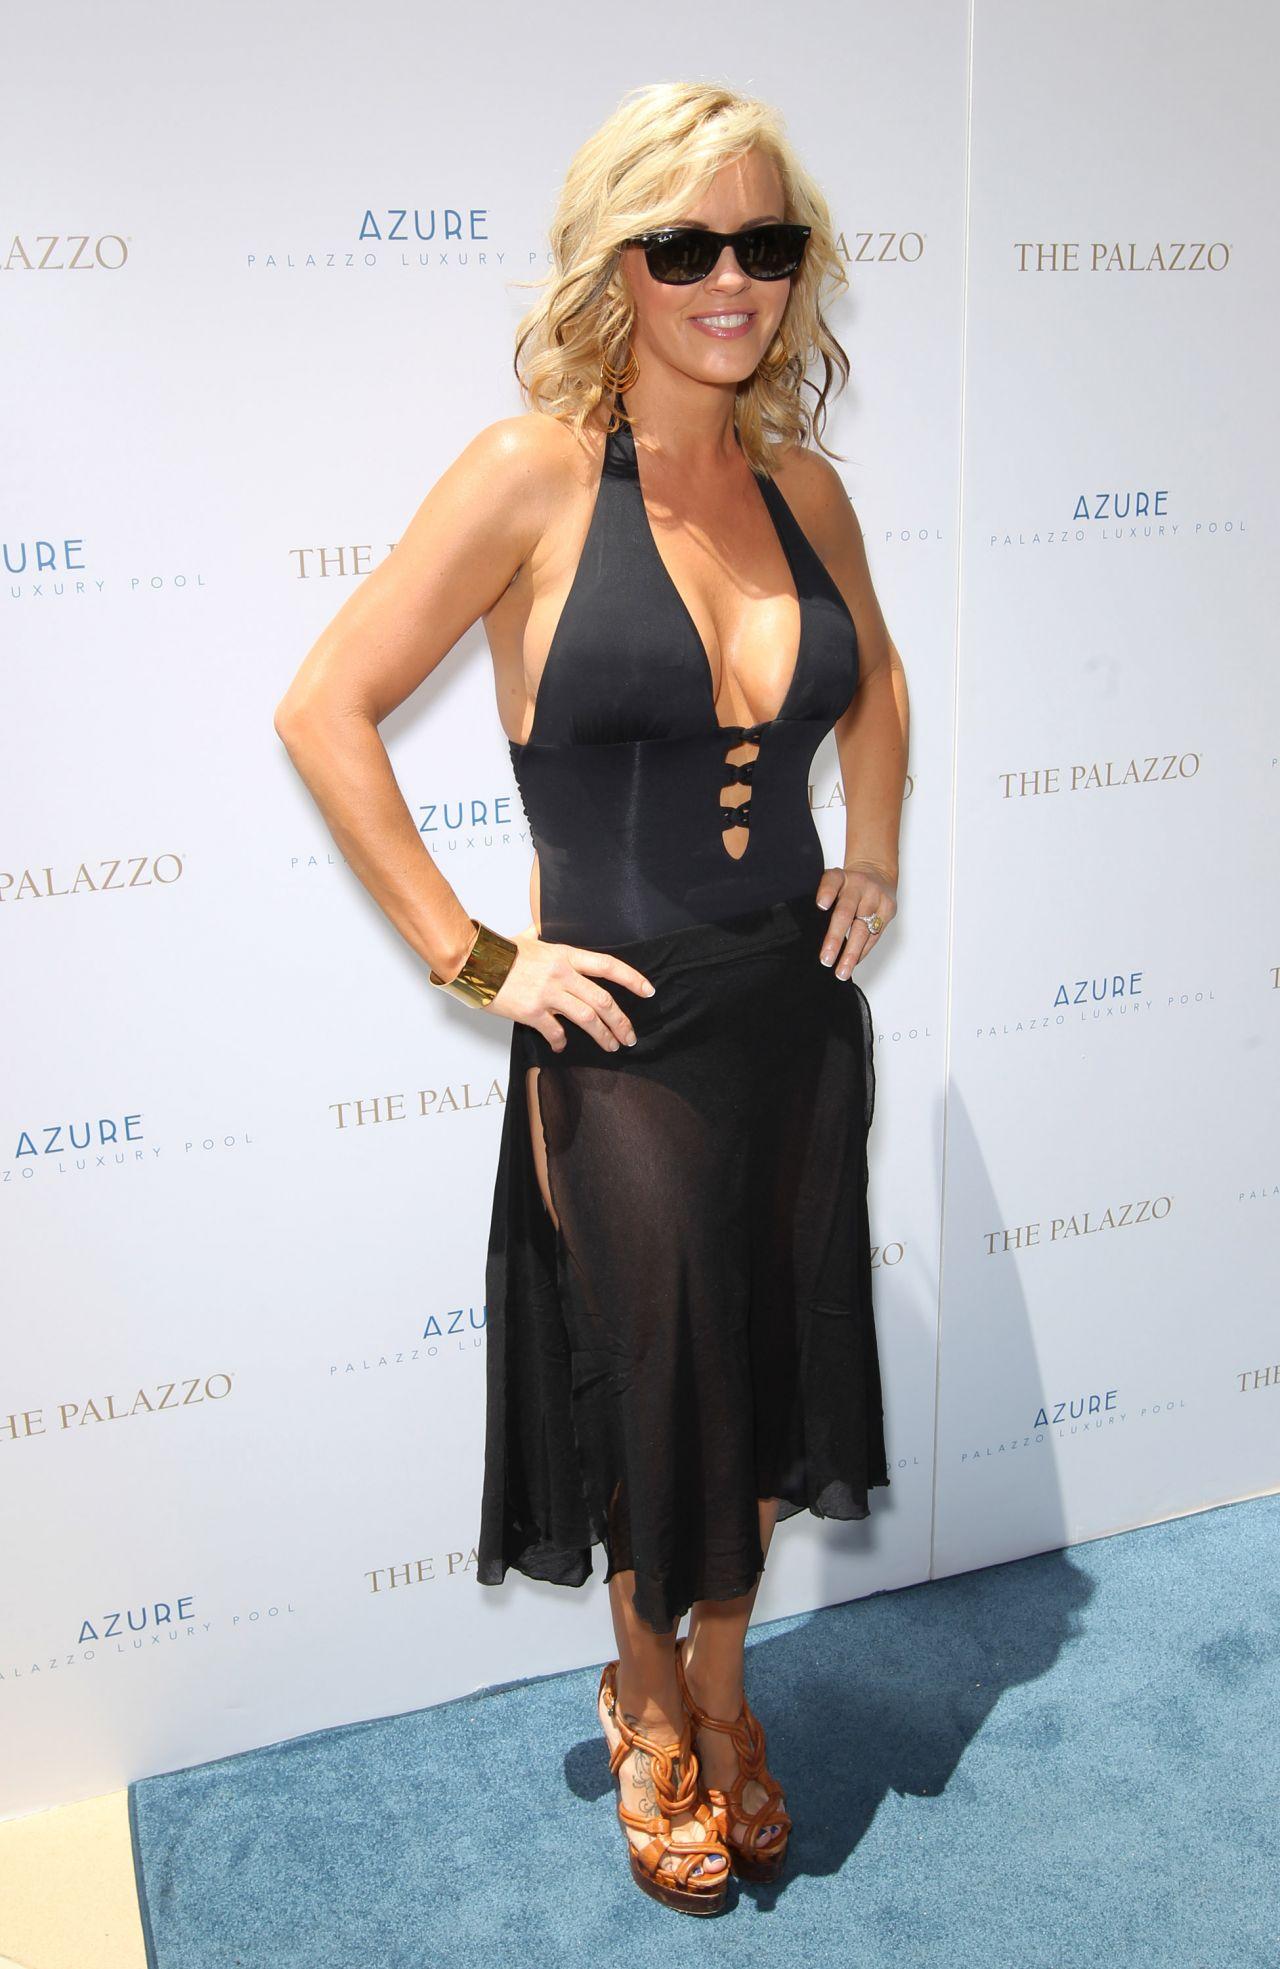 Scheduled celebrity appearances in Vegas - Las Vegas Forum